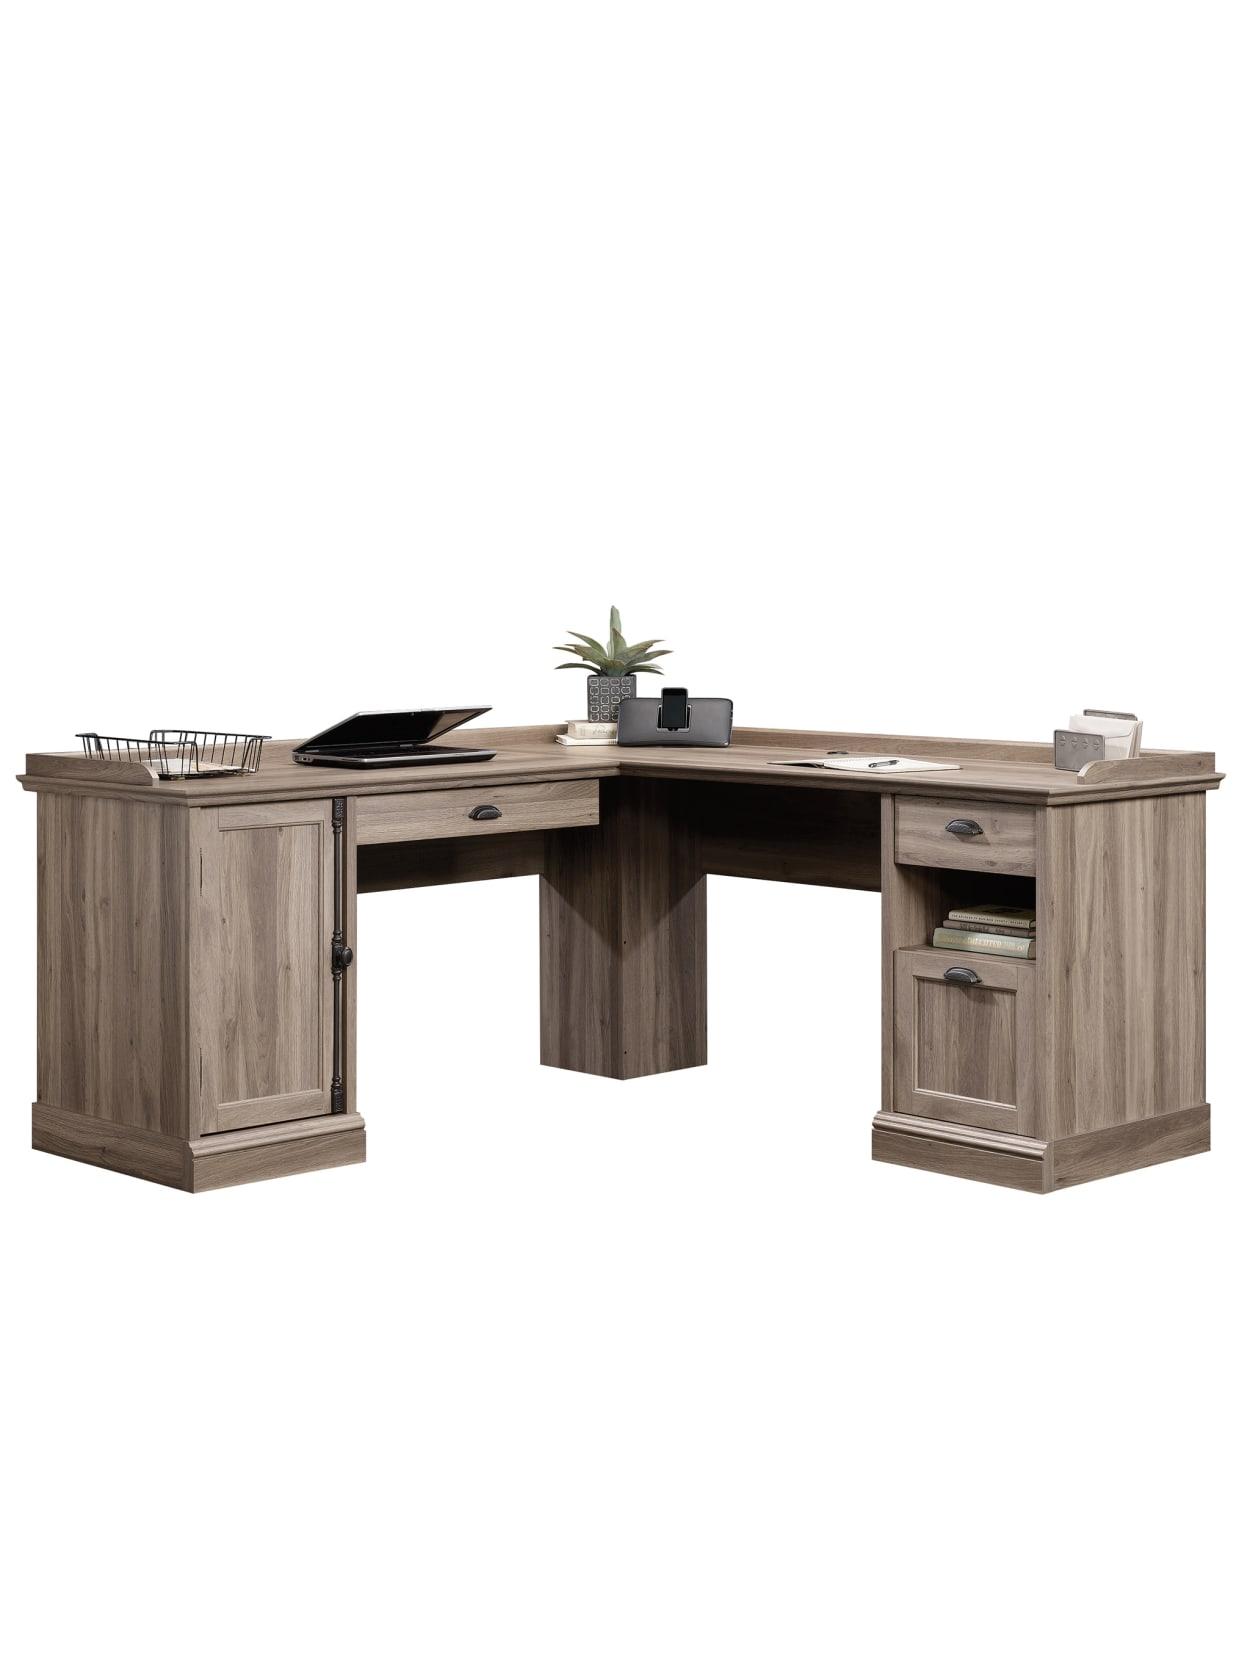 Sauder Barrister Lane L Shaped Computer Desk Salt Oak - Office Depot